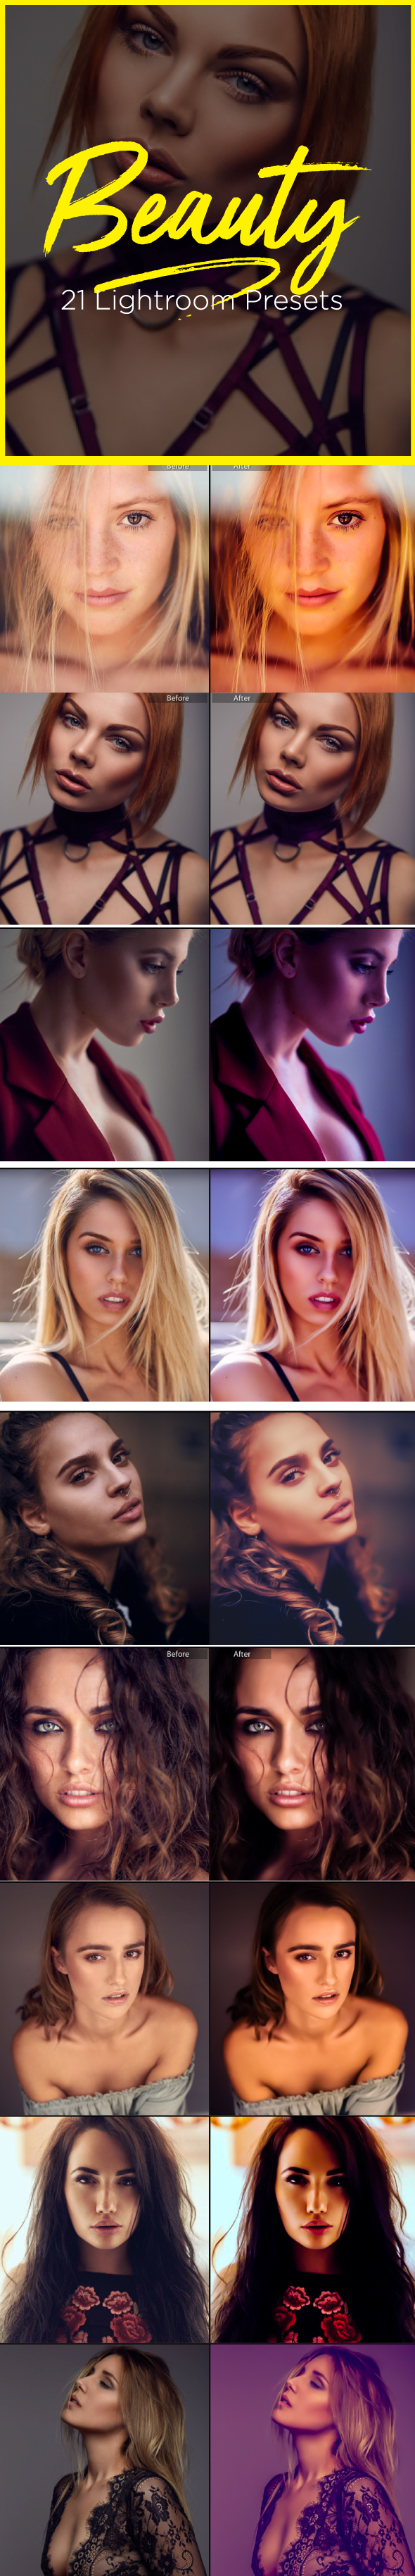 21 Pro Beauty Portrait Retouching Lightroom Presets - Portrait Lightroom Presets